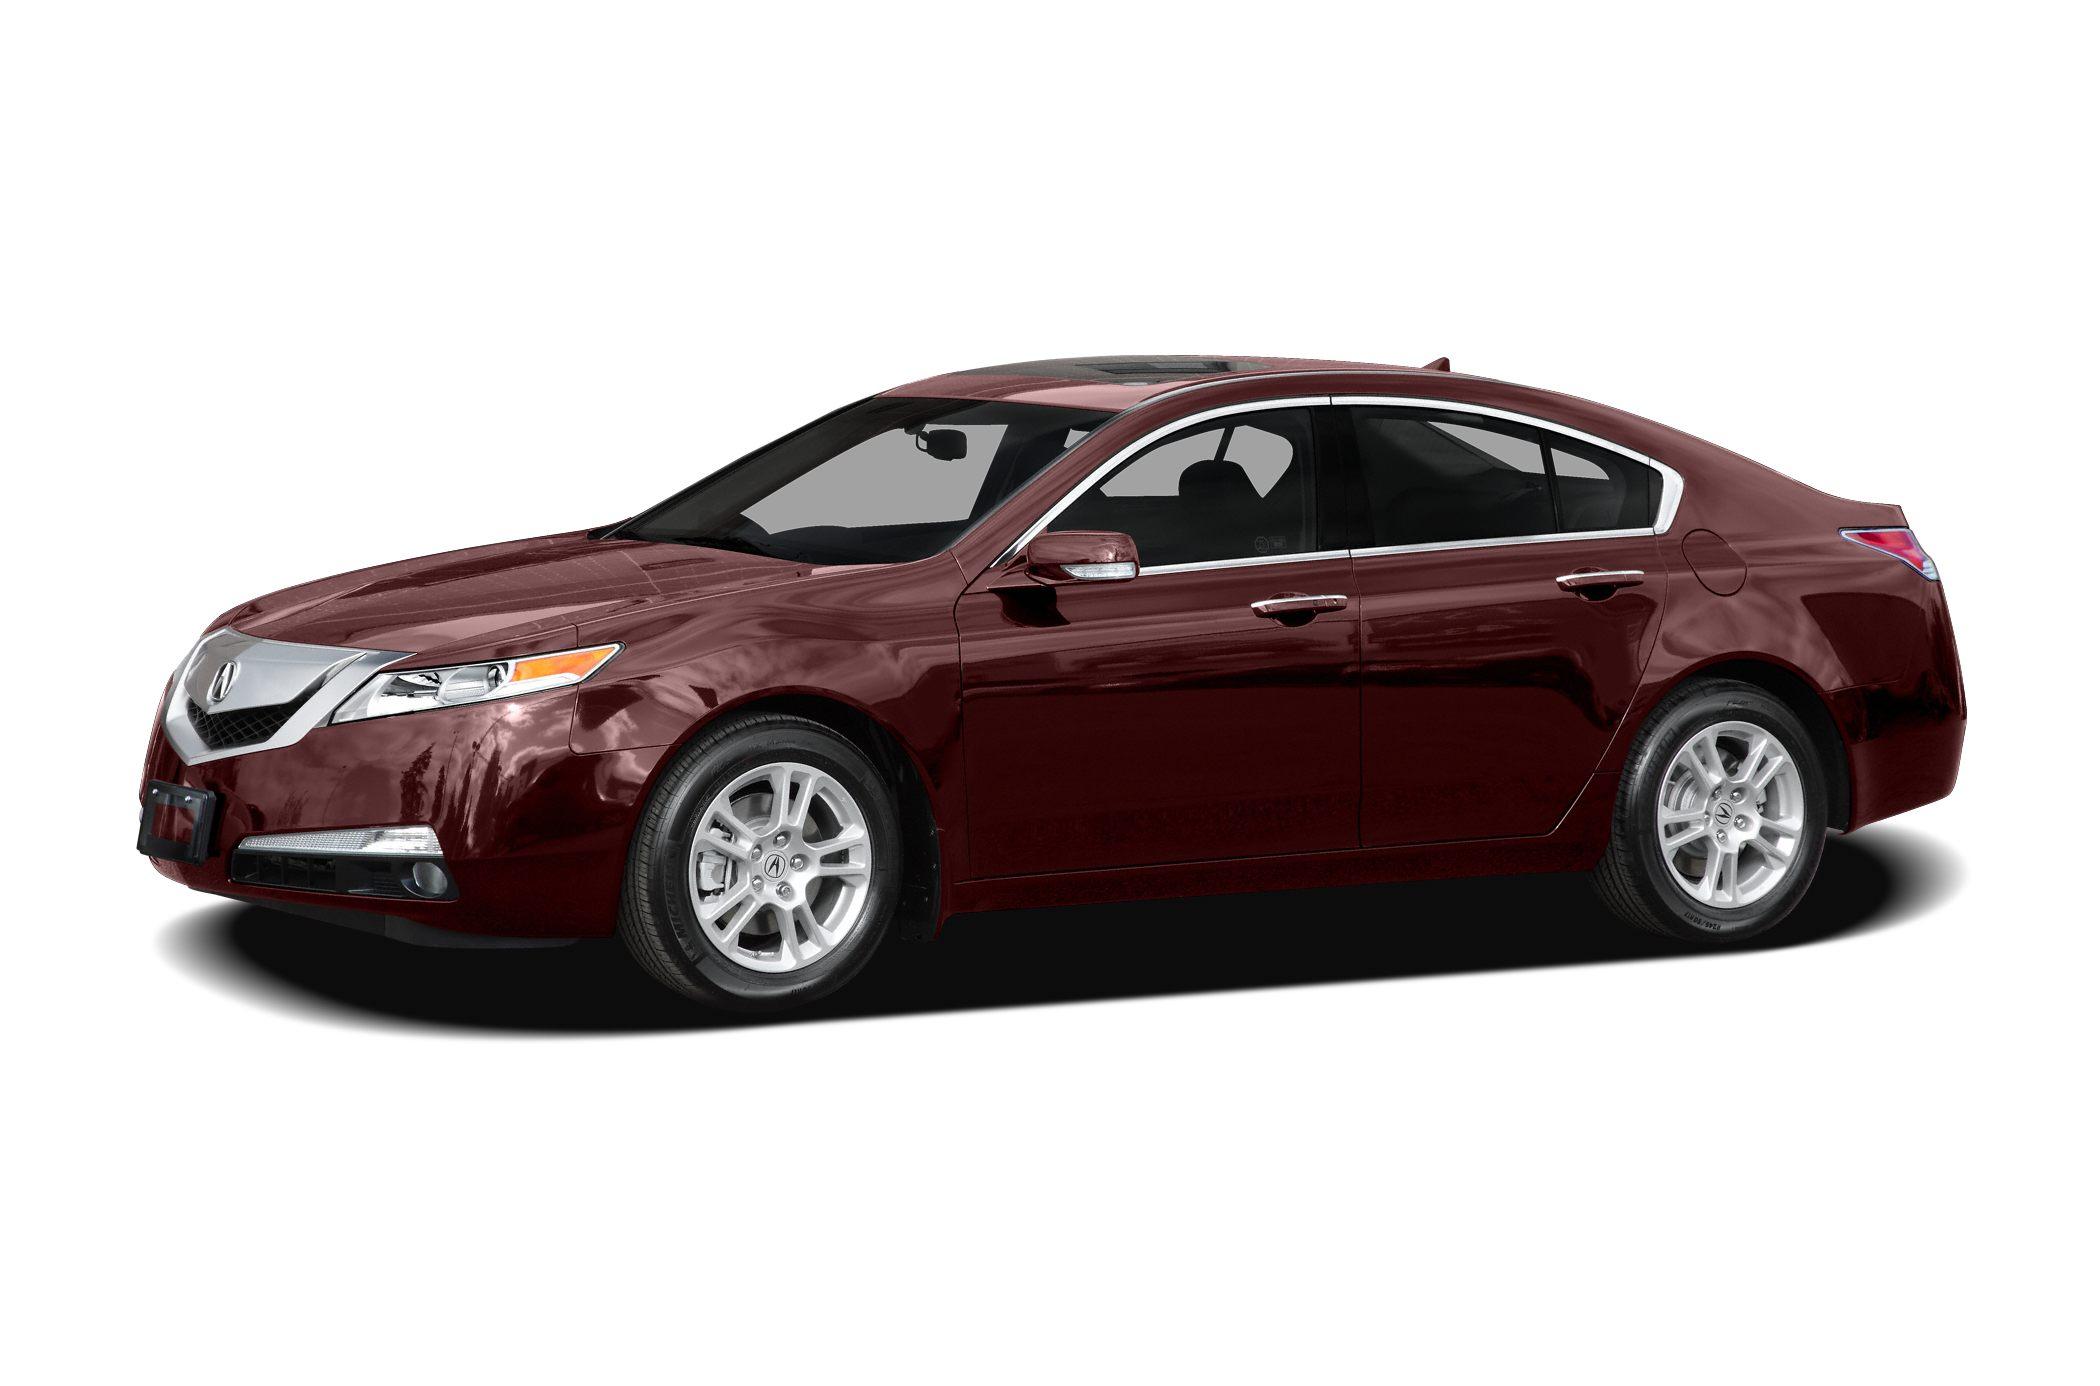 2009 Acura TL Information